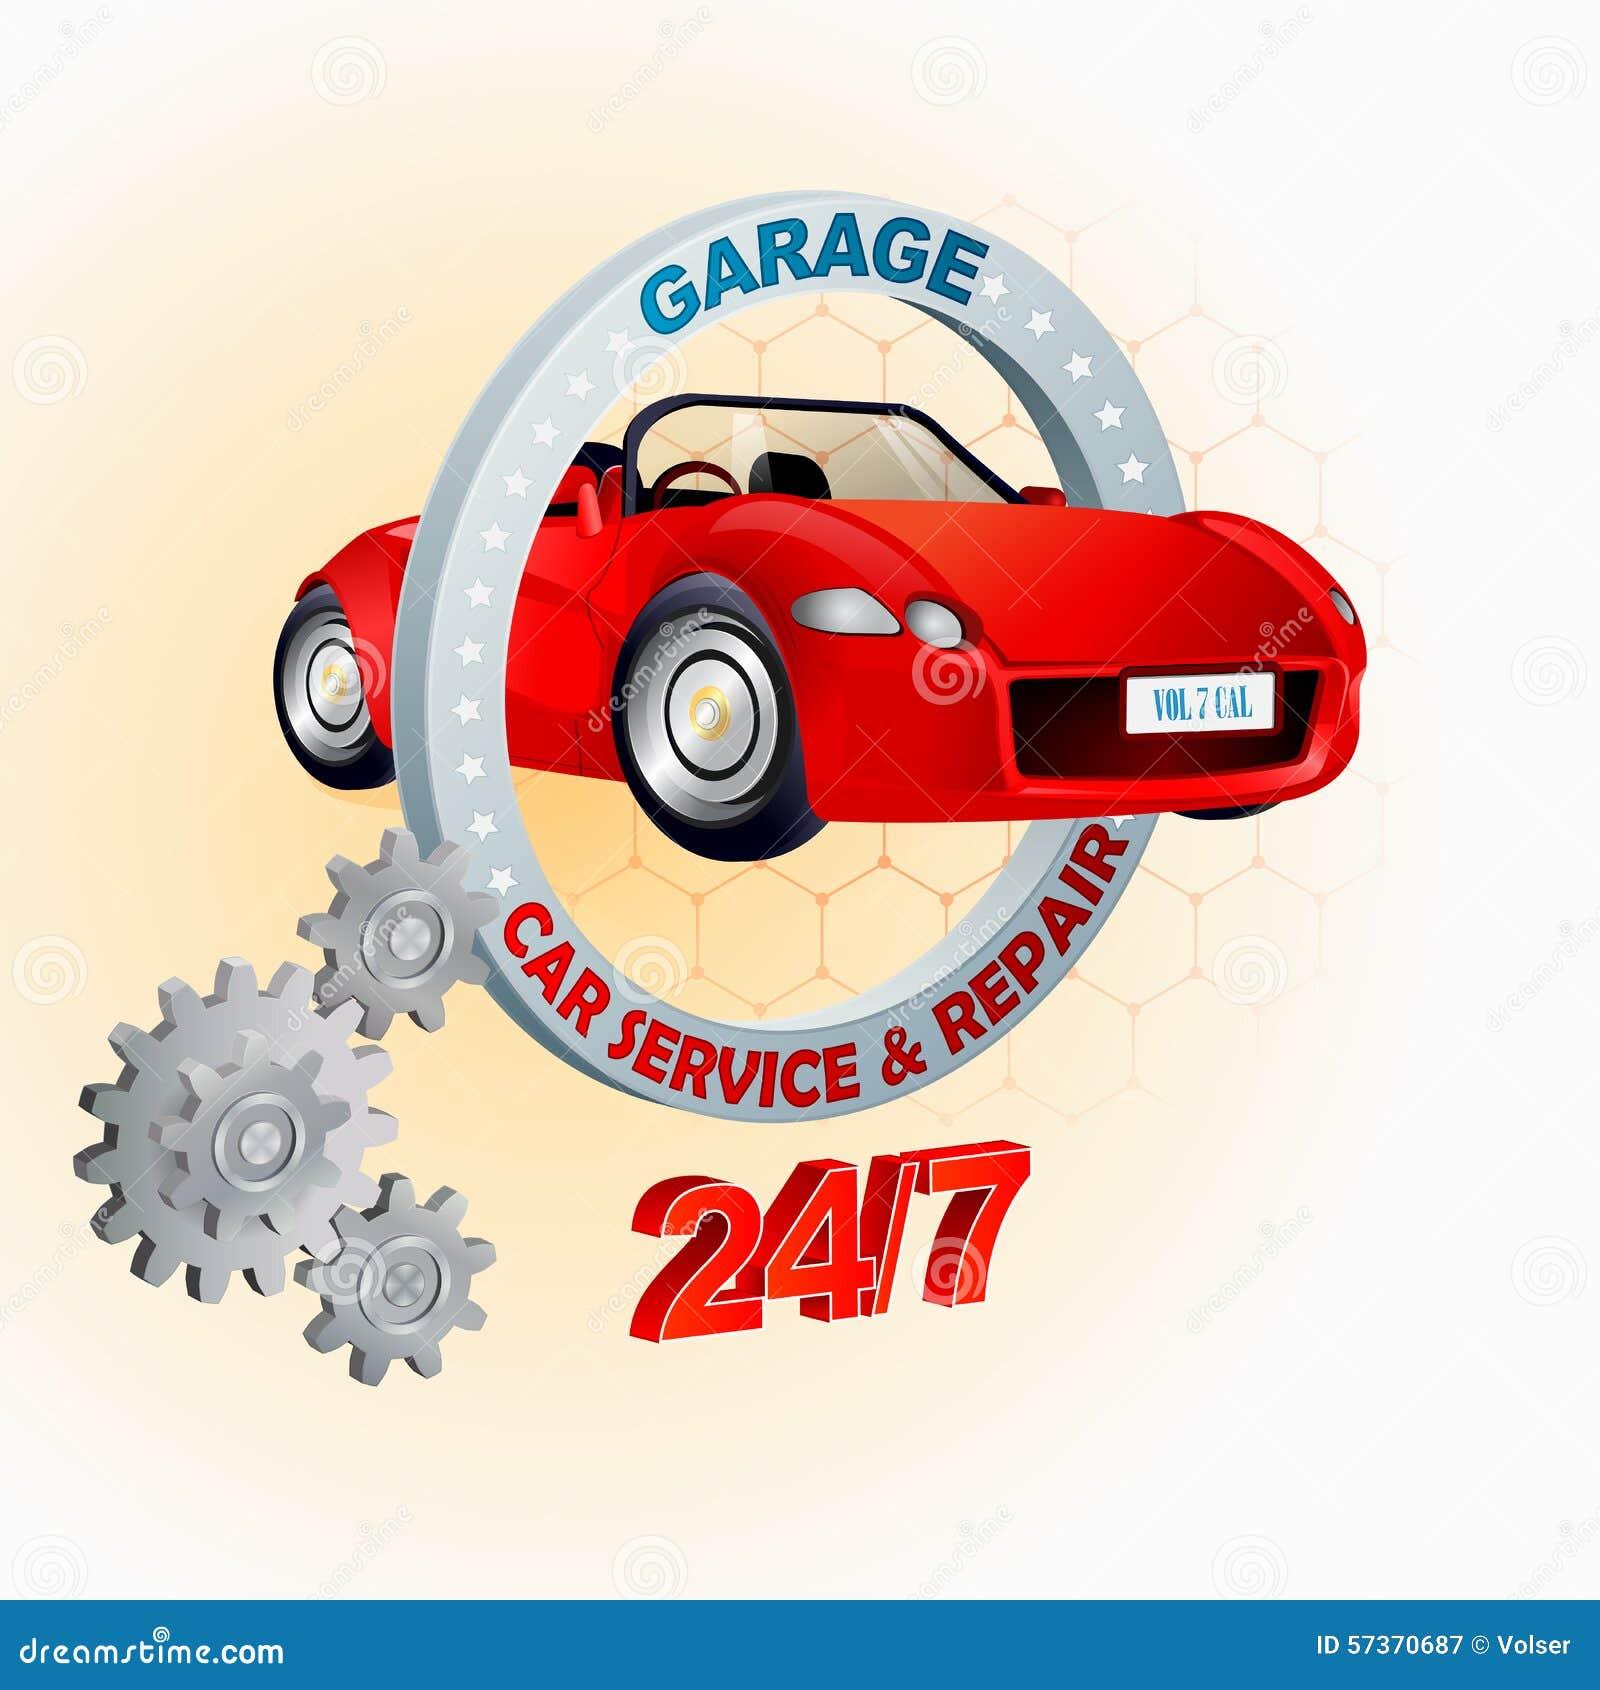 Modern Garage Signs : Modern design template for garage car service and repair